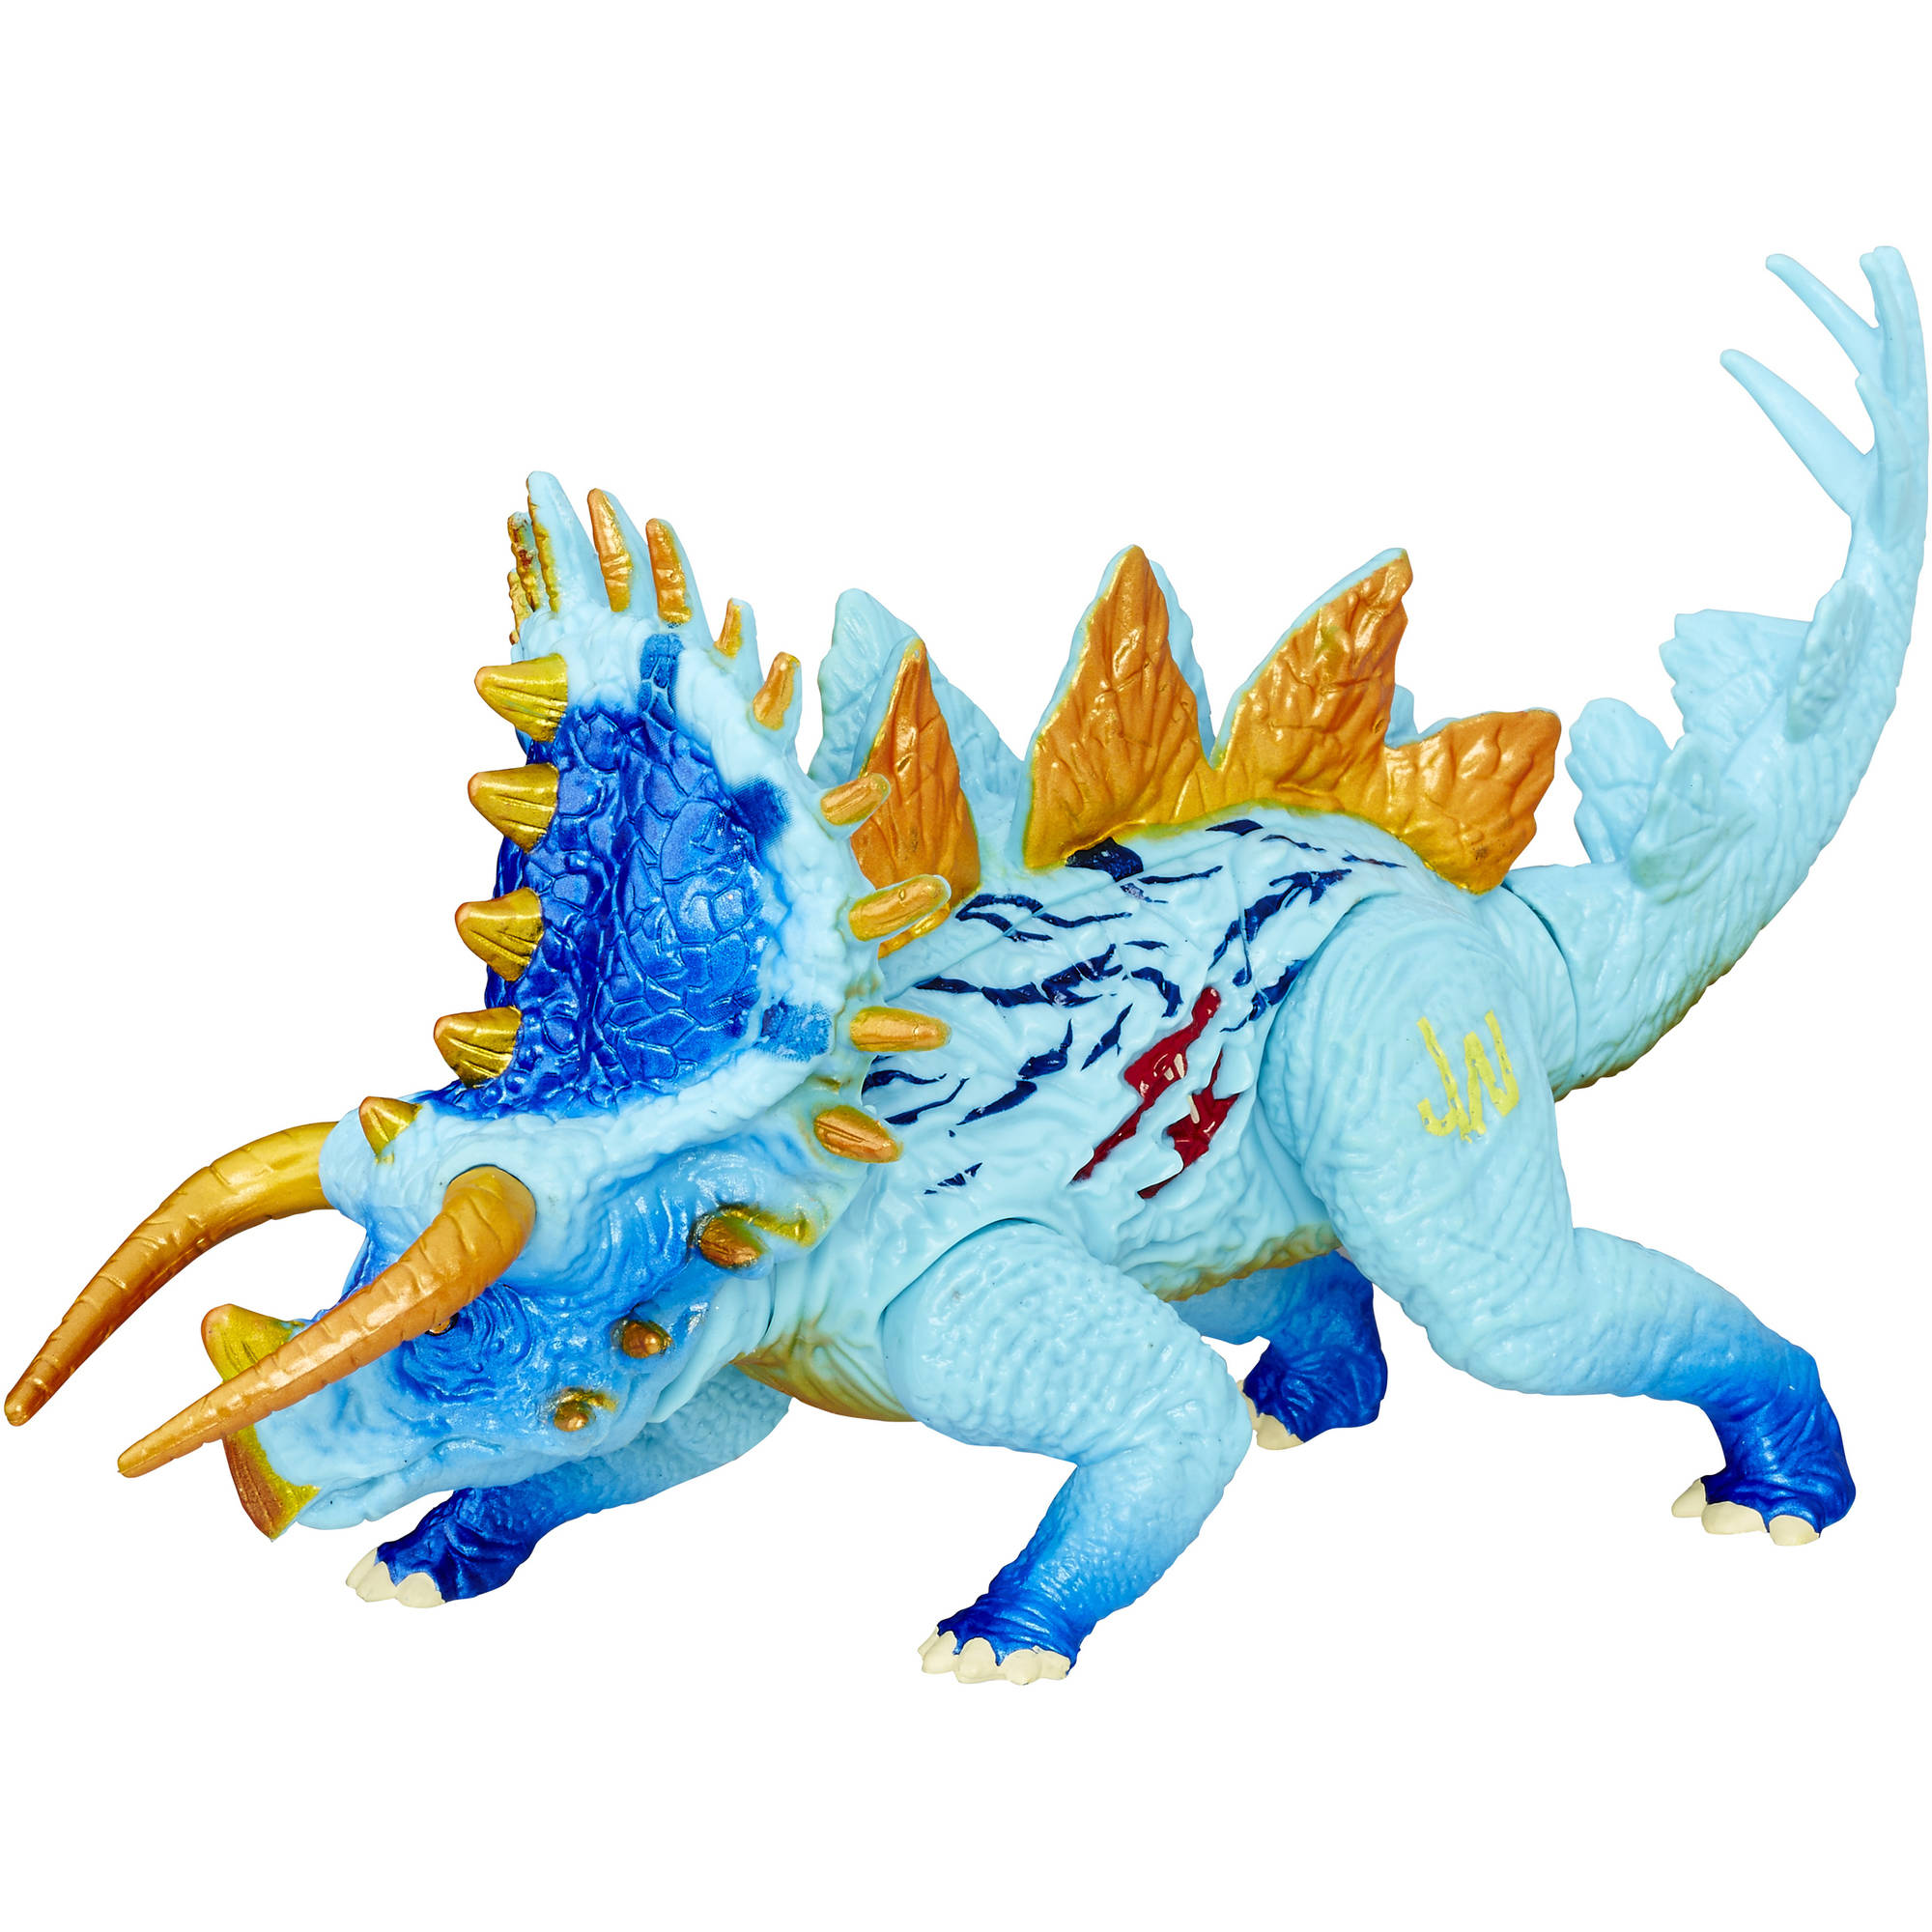 Jurassic World Hybrid Stegoceratops